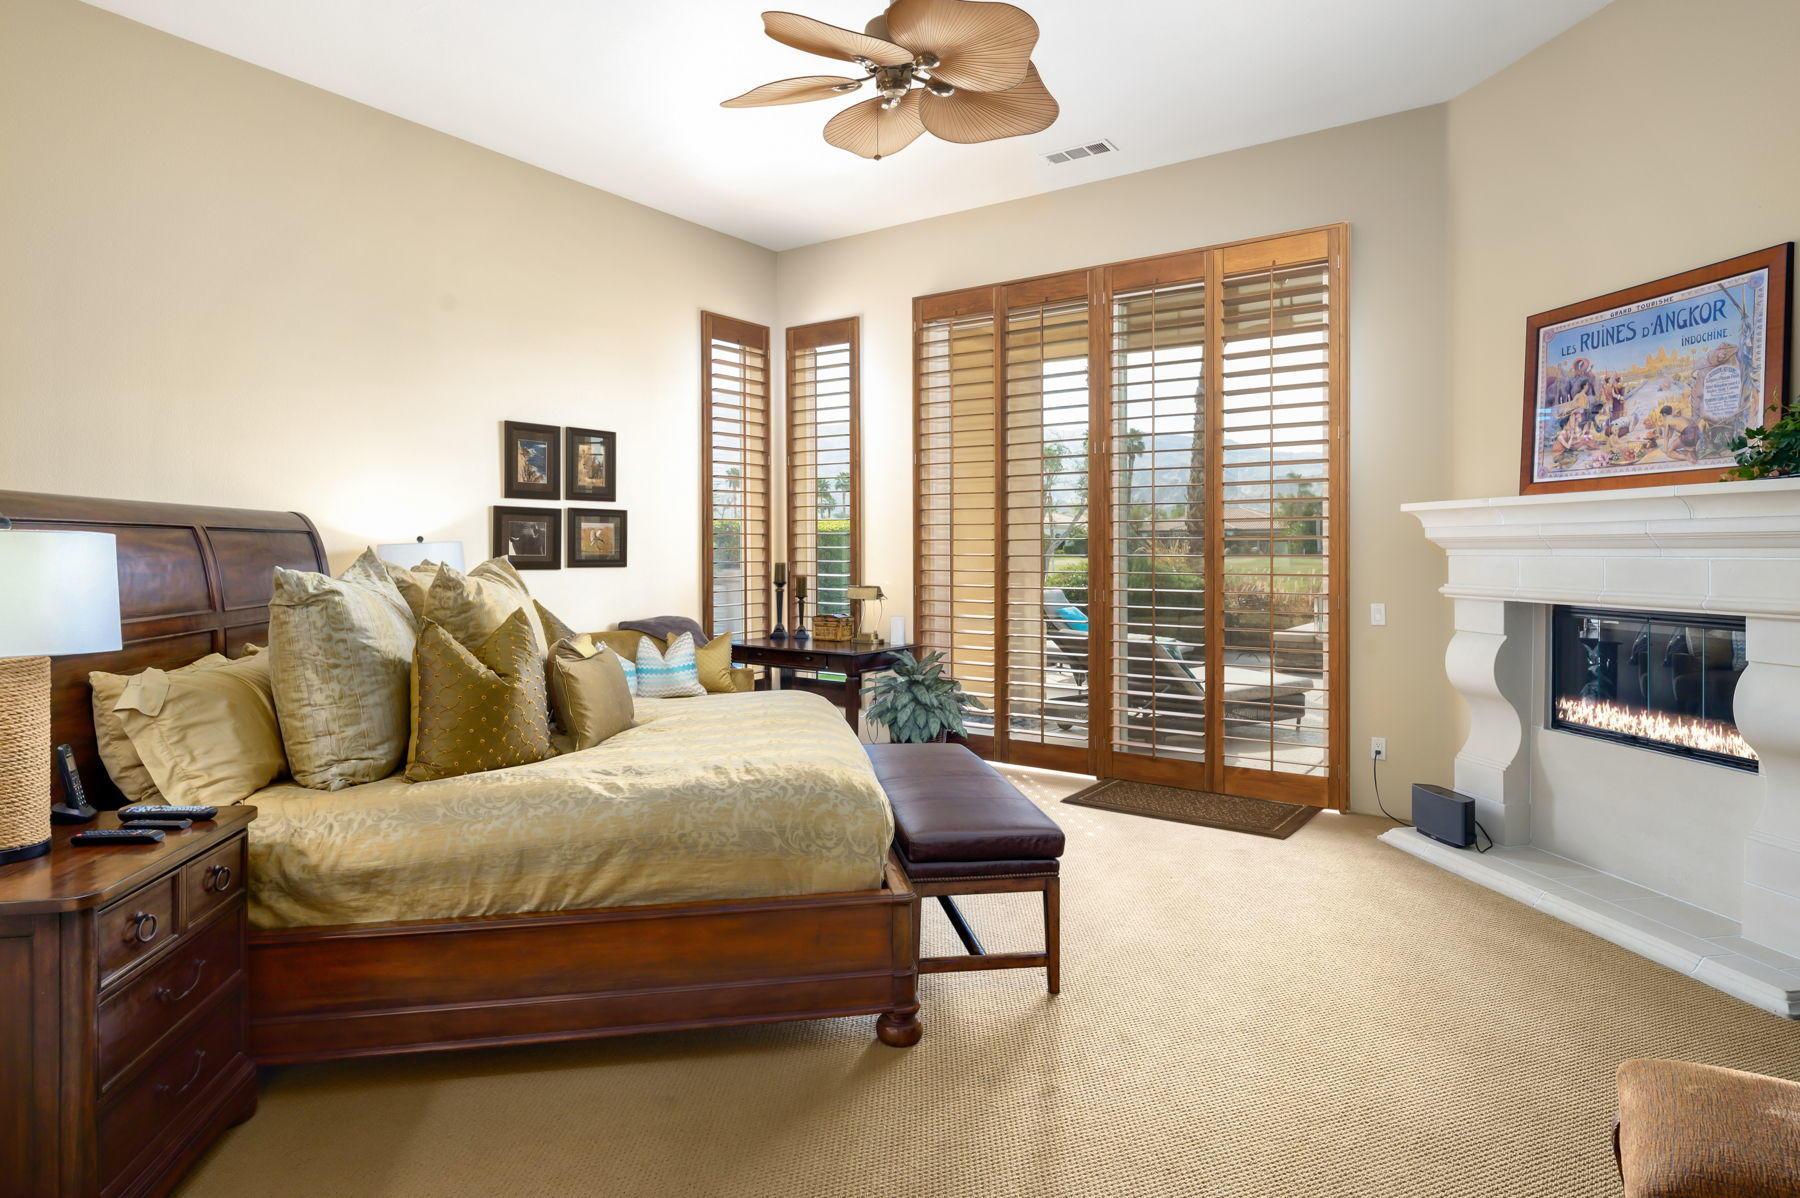 56023 Winged Foot, La Quinta, California 92253, 3 Bedrooms Bedrooms, ,4 BathroomsBathrooms,Residential,For Sale,56023 Winged Foot,219041335